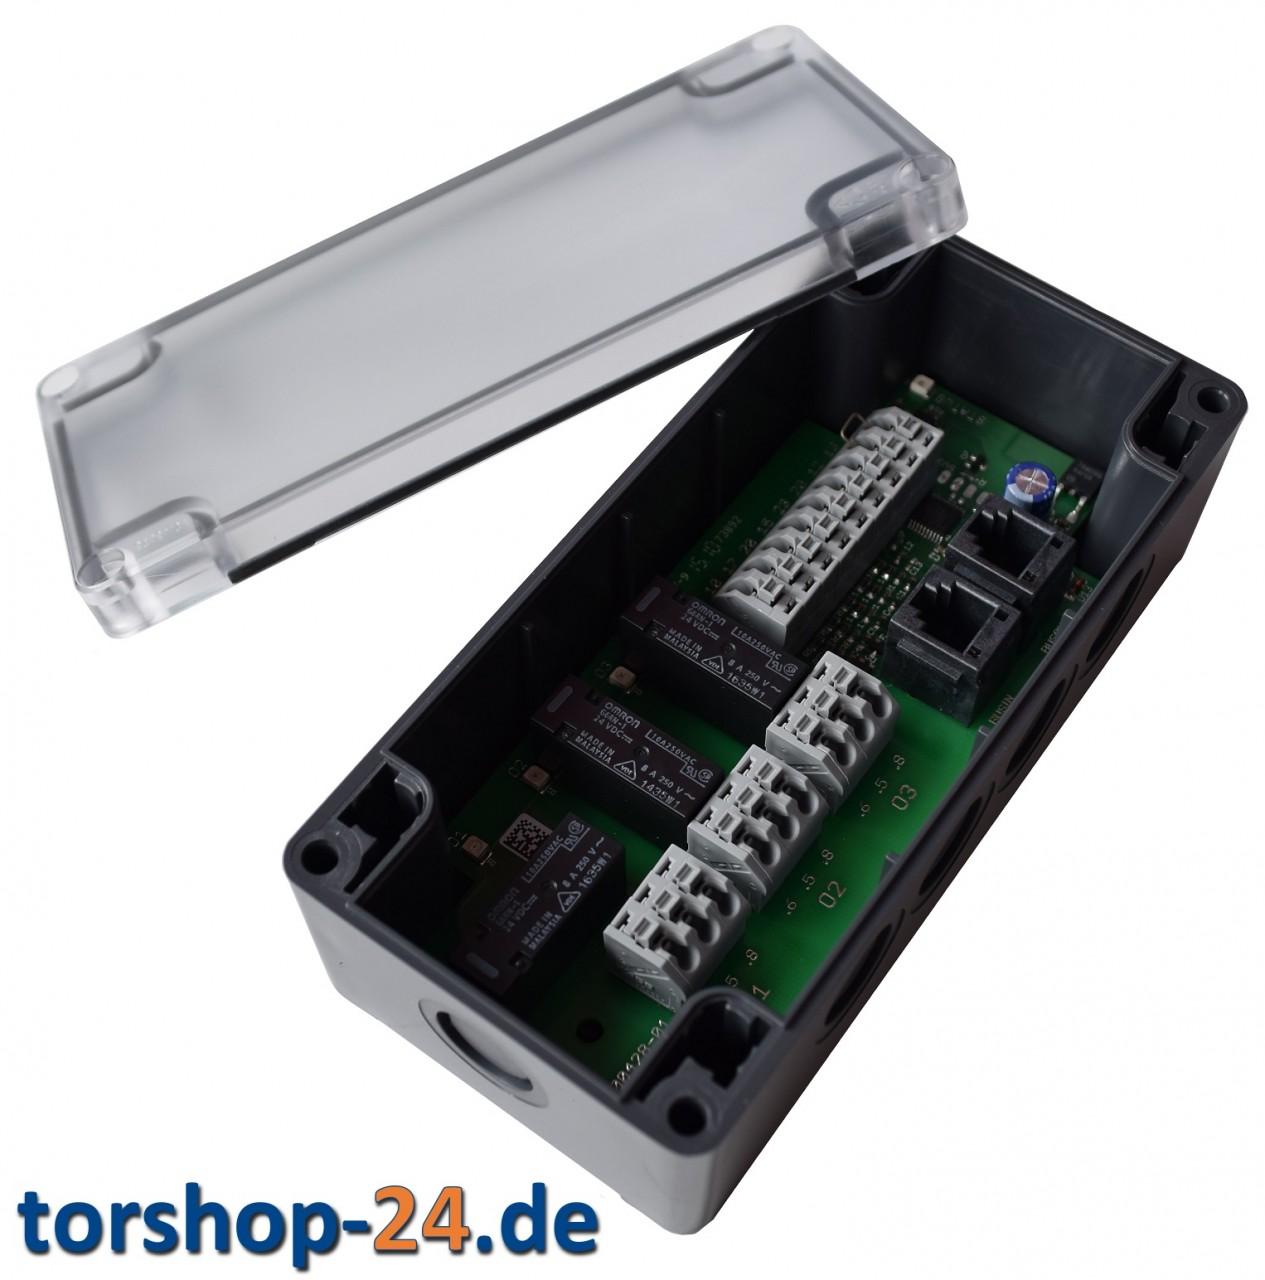 Hörmann Universaladapterplatine UAP 1